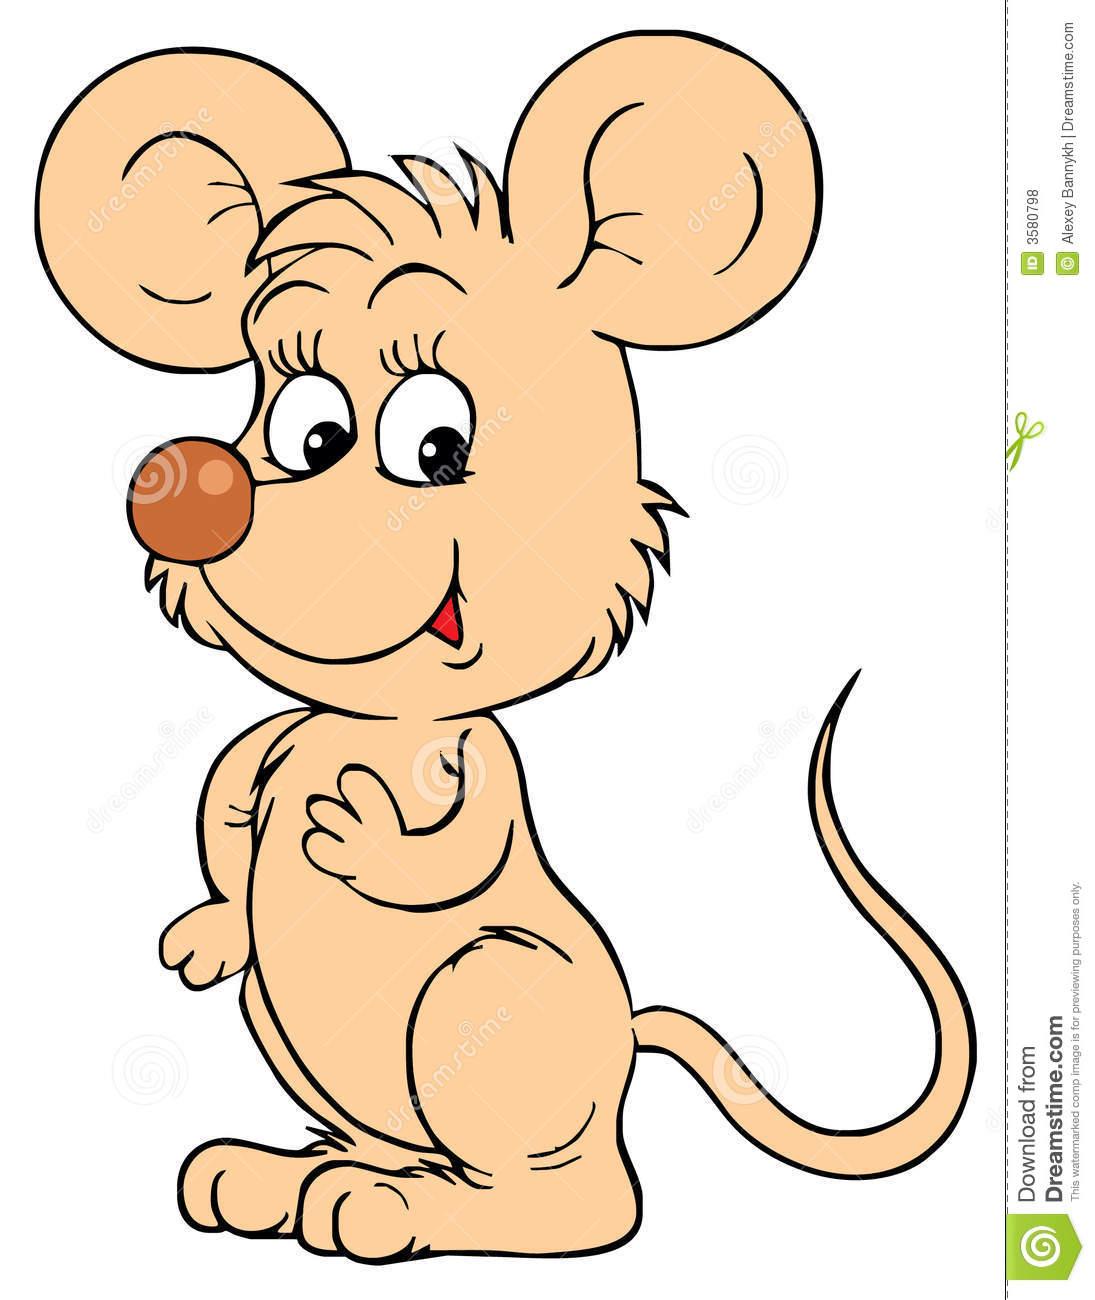 Mice Clipart - Clipart Kid